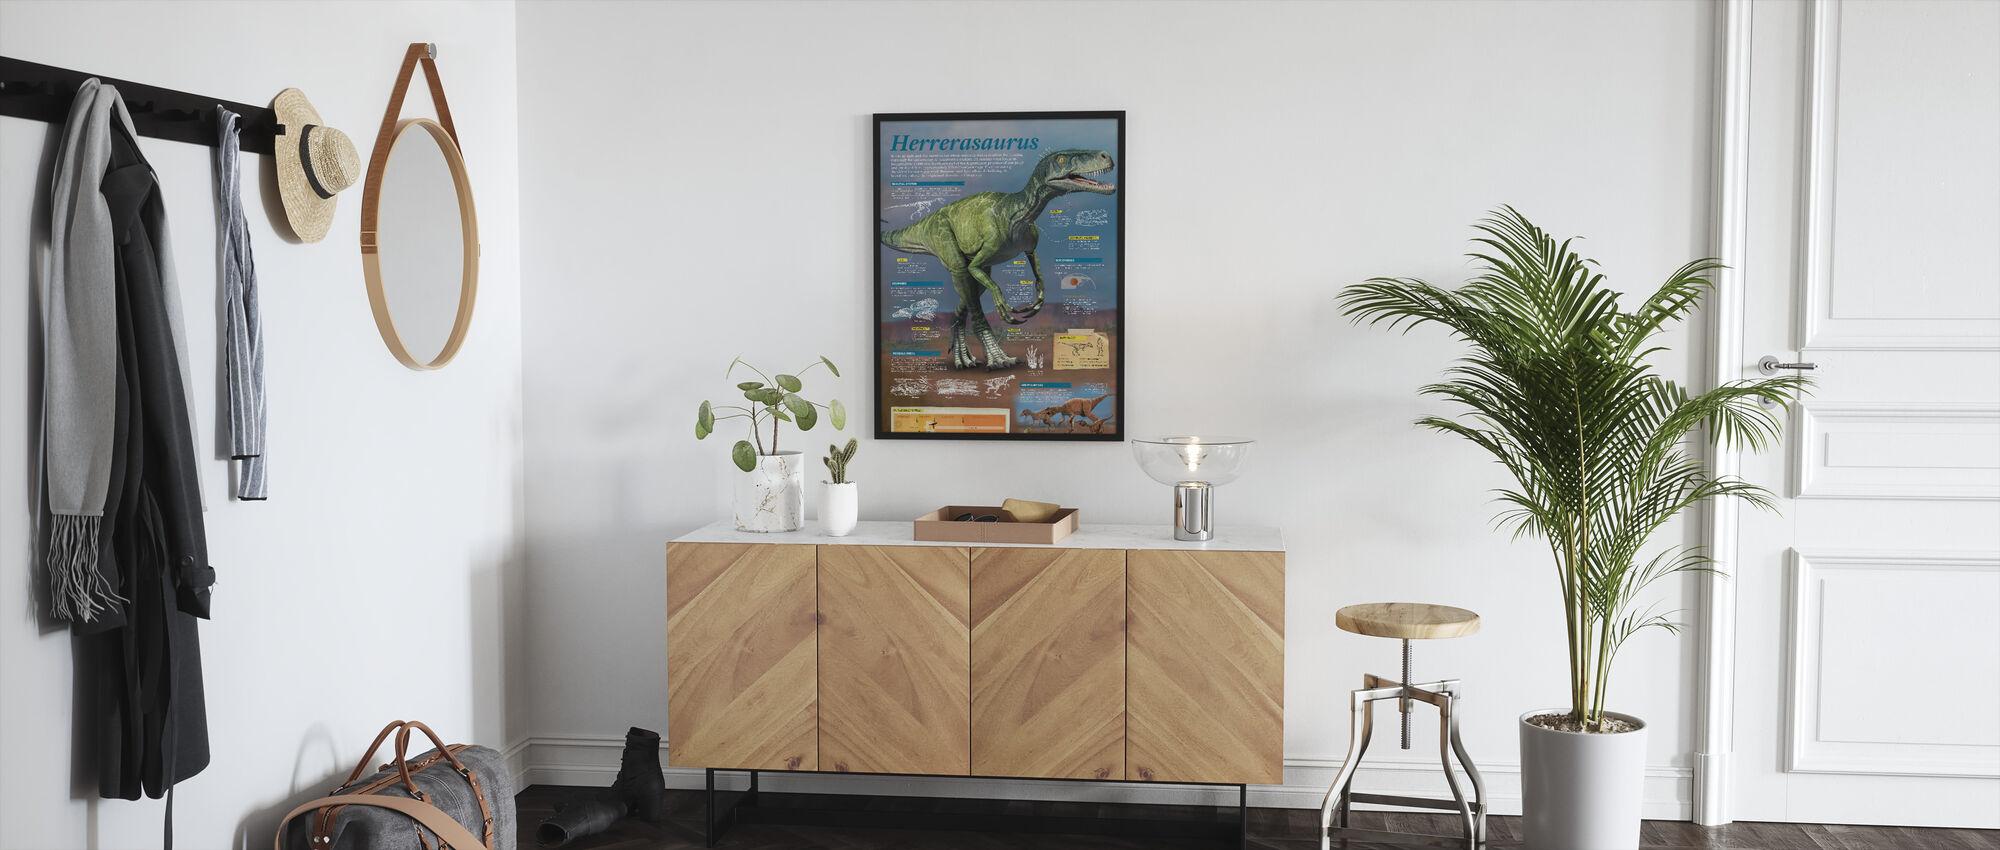 Herrerasaurus - Innrammet bilde - Gang